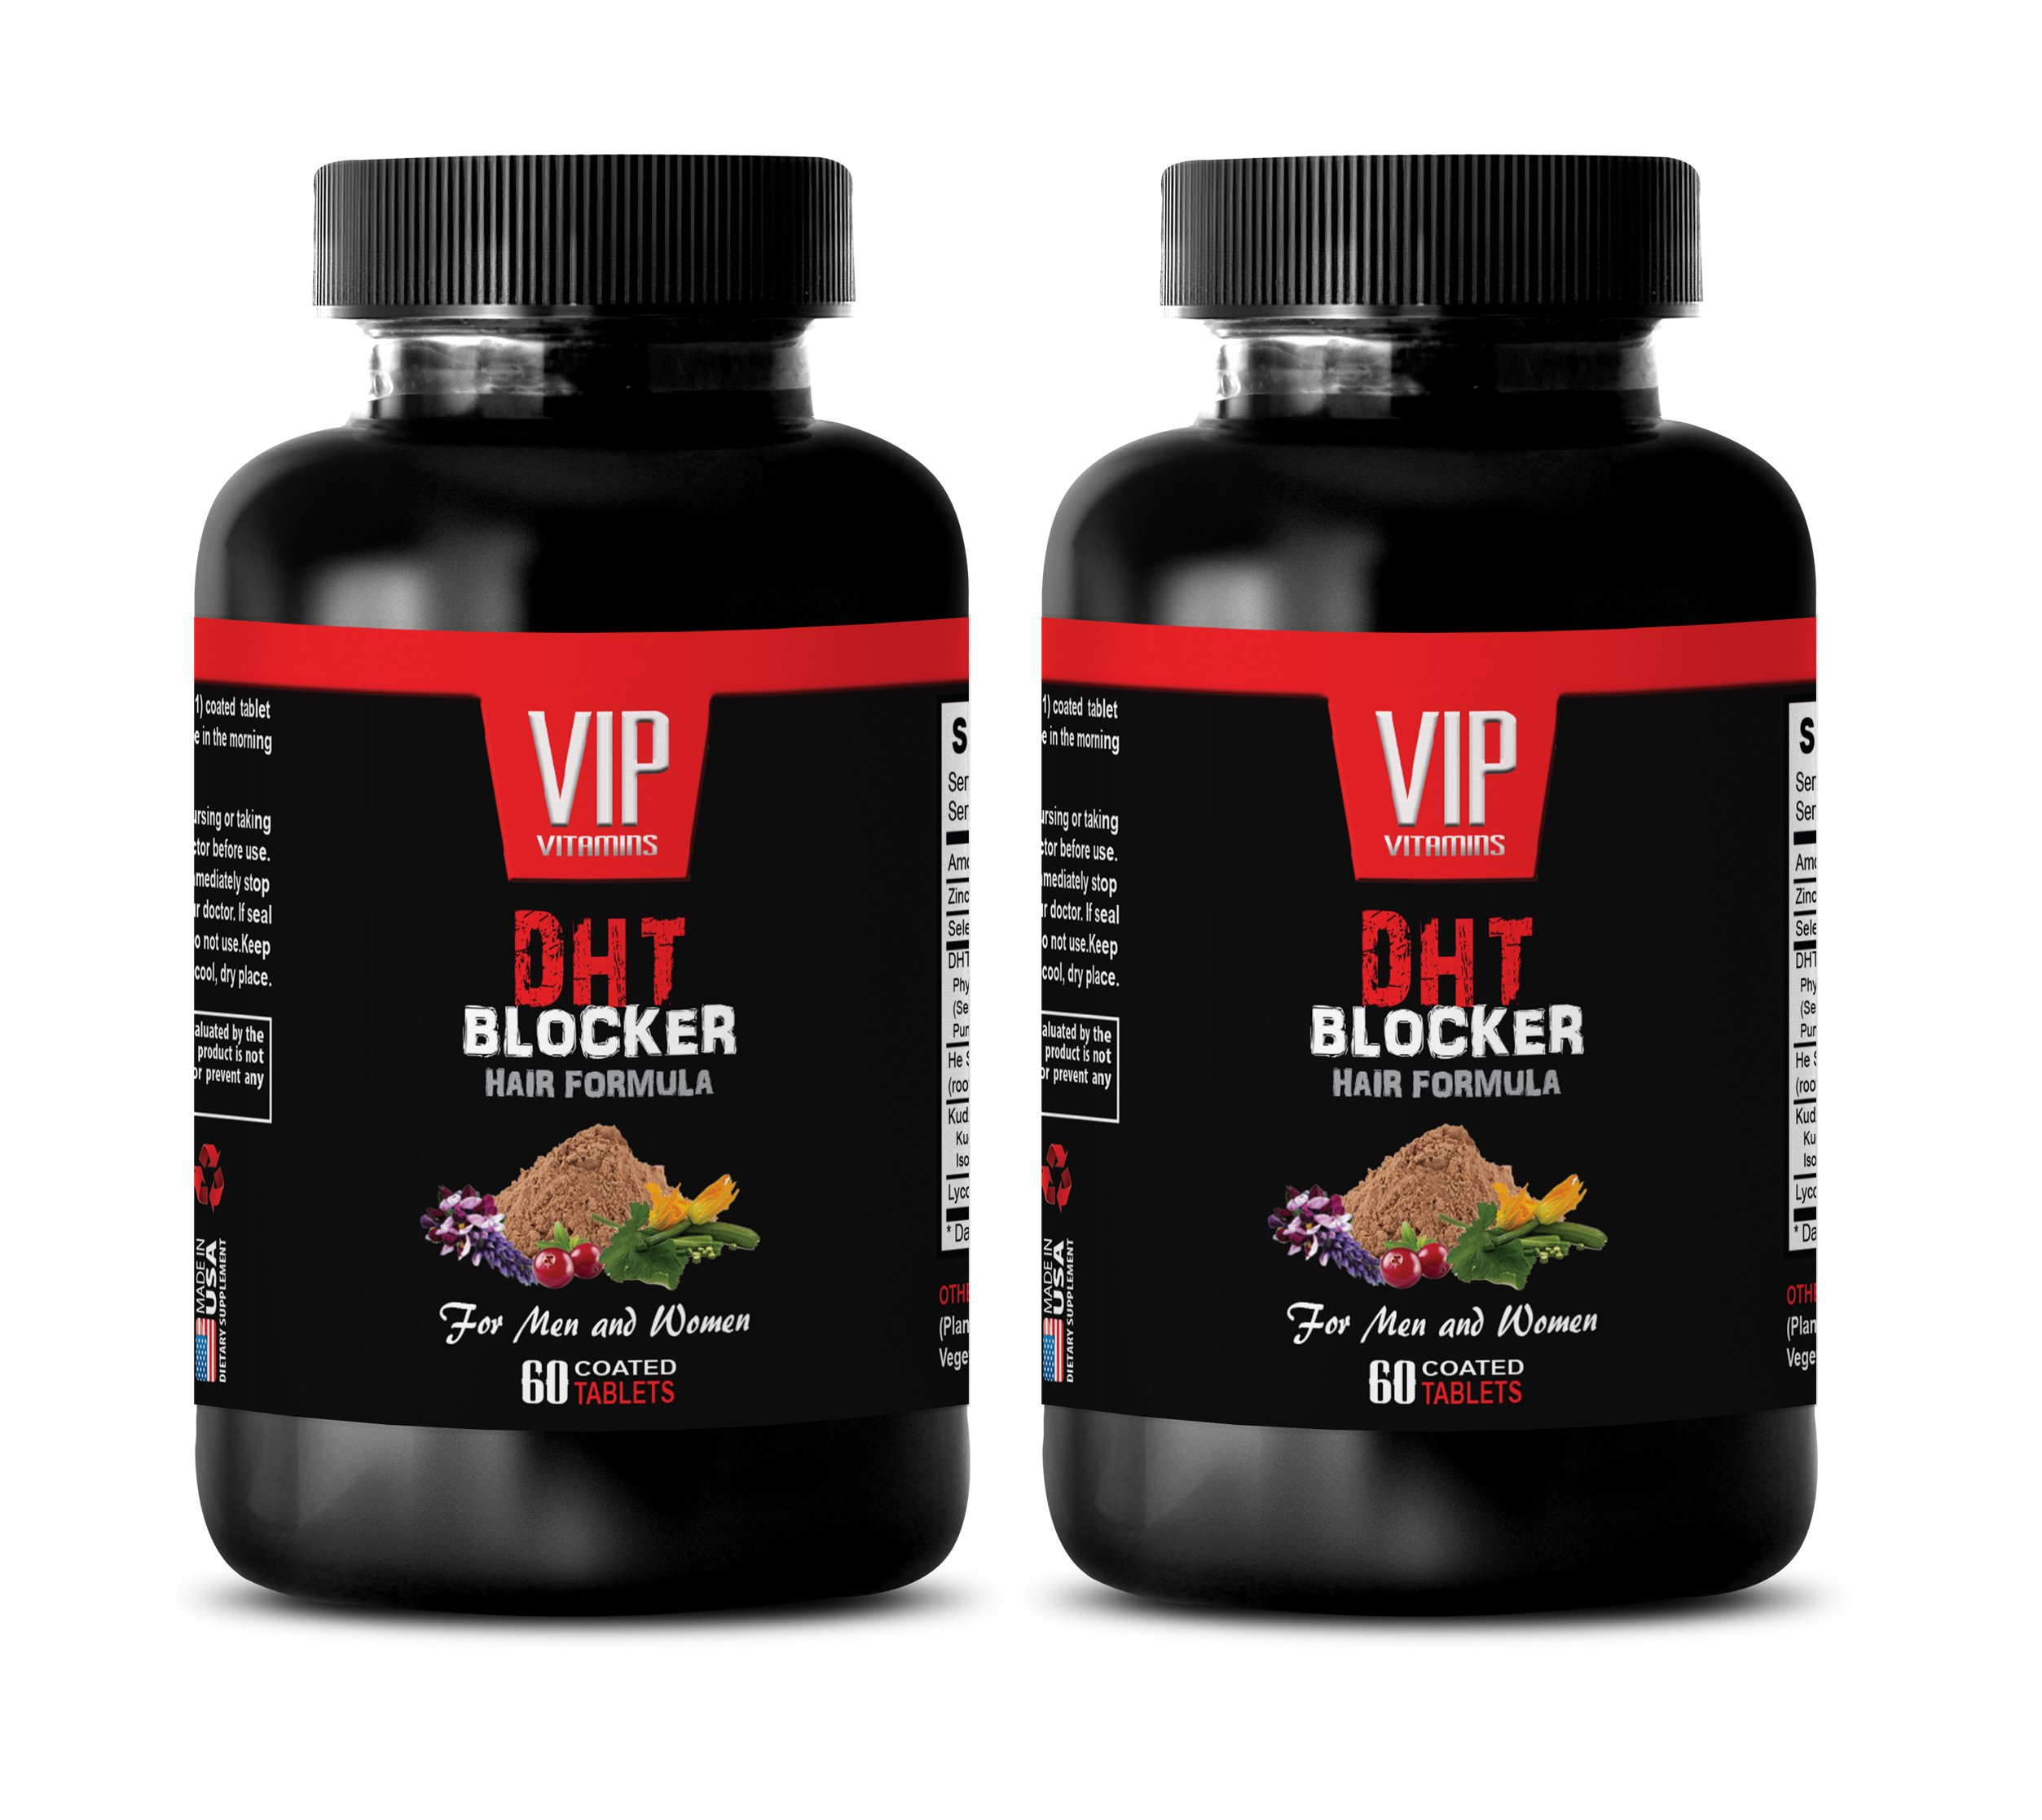 hair loss supplements zinc - DHT BLOCKER HAIR FORMULA - FOR MEN AND WOMEN - he shou wu for gray hair - 2 Bottles 120 Coated Tablets